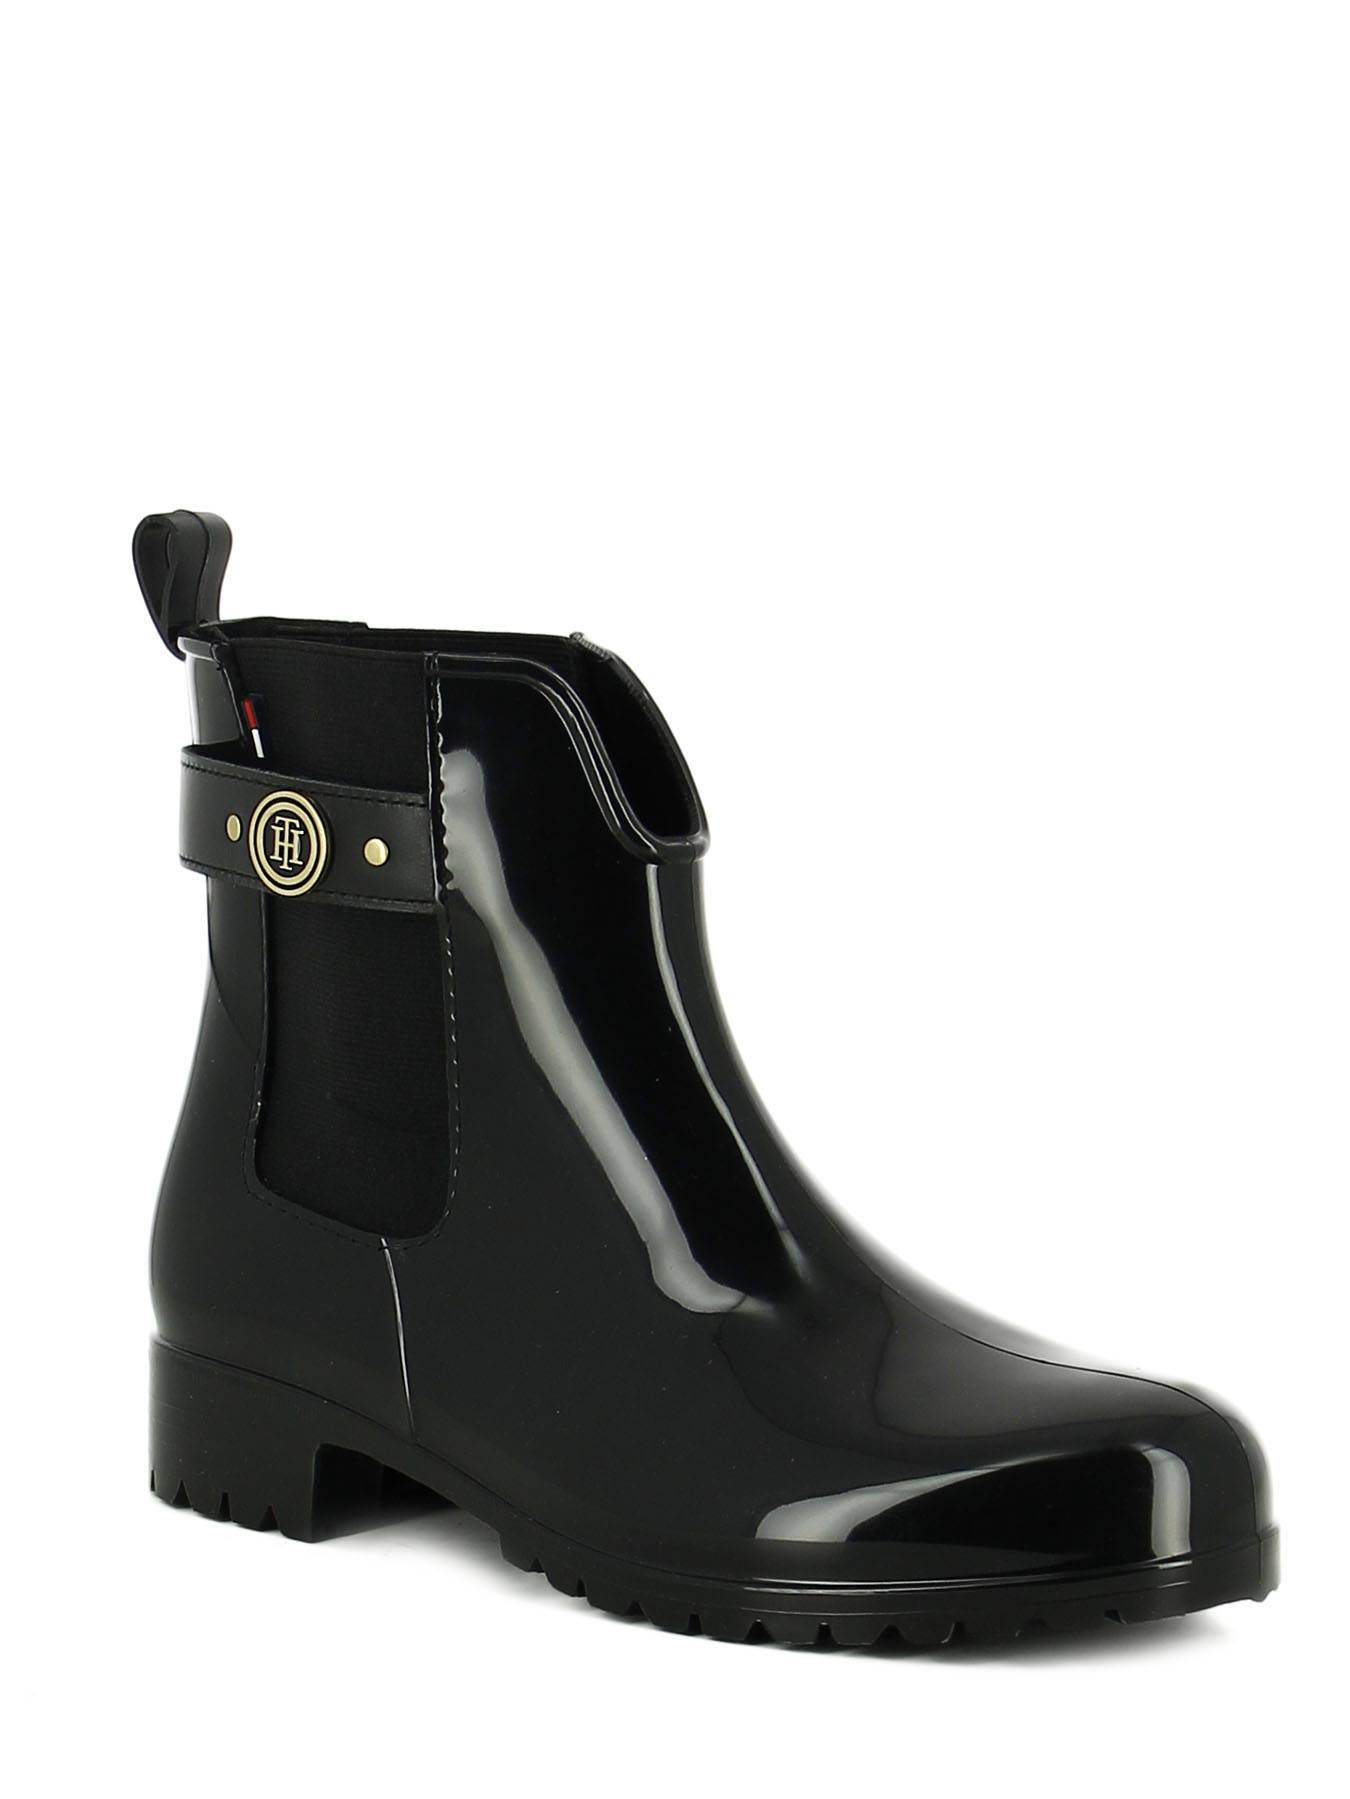 boots tommy hilfiger black en vente au meilleur prix. Black Bedroom Furniture Sets. Home Design Ideas